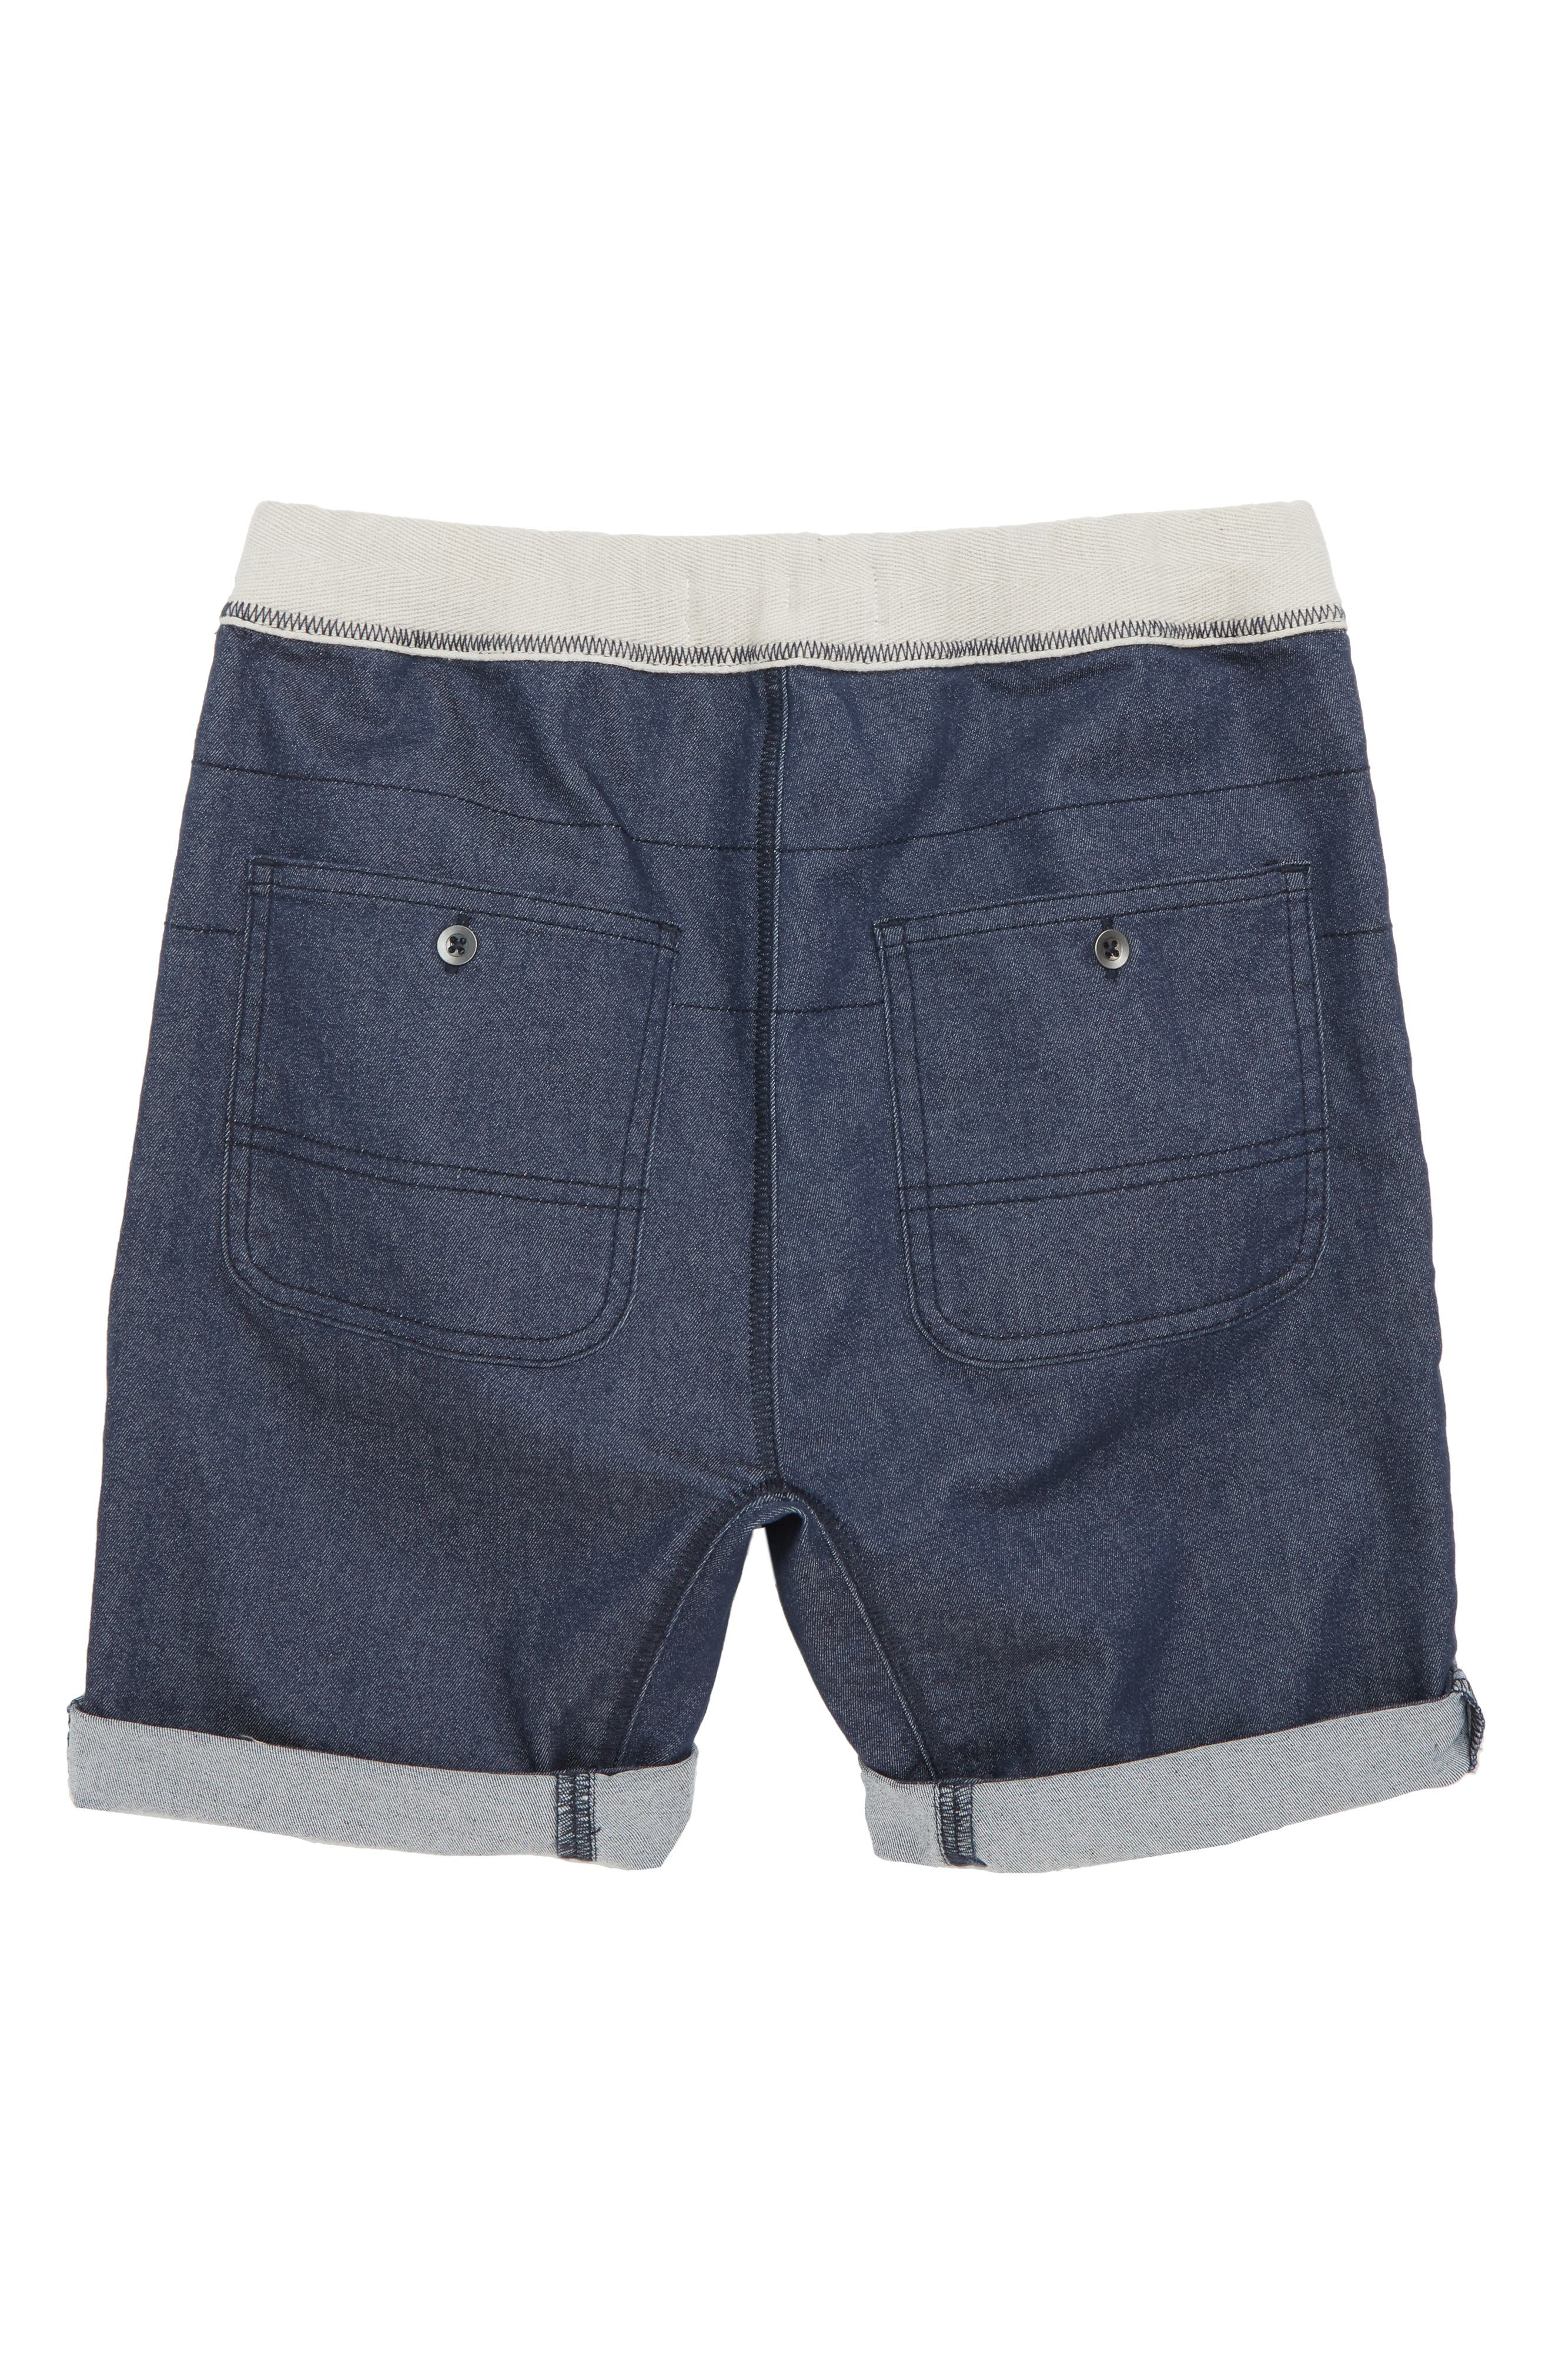 Twill Shorts,                             Alternate thumbnail 2, color,                             Navy Indigo